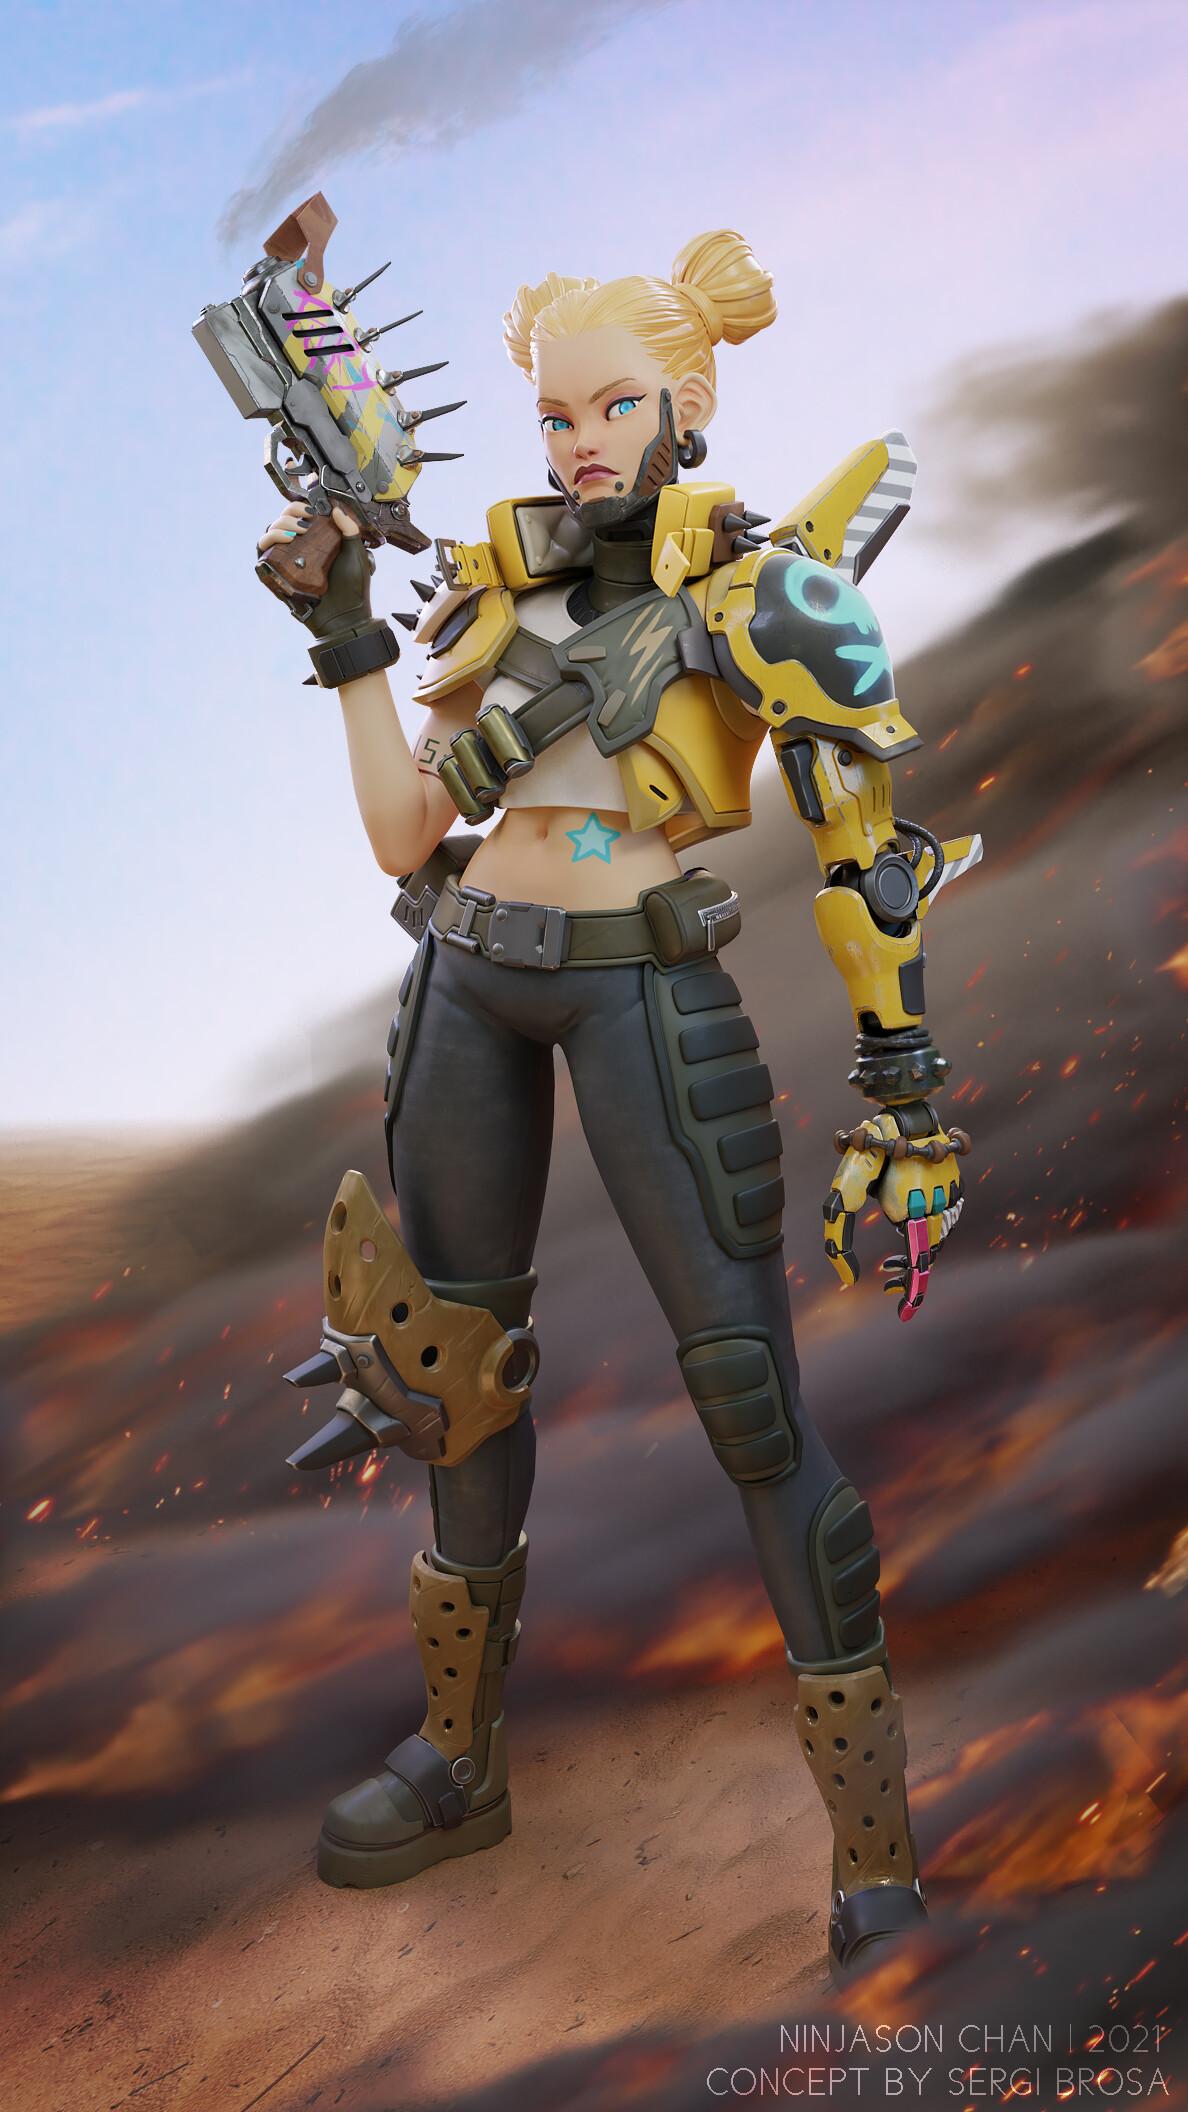 NinJason Chan Artwork Digital Art Women Girls With Guns Blonde Science Fiction Science Fiction Women 1188x2112